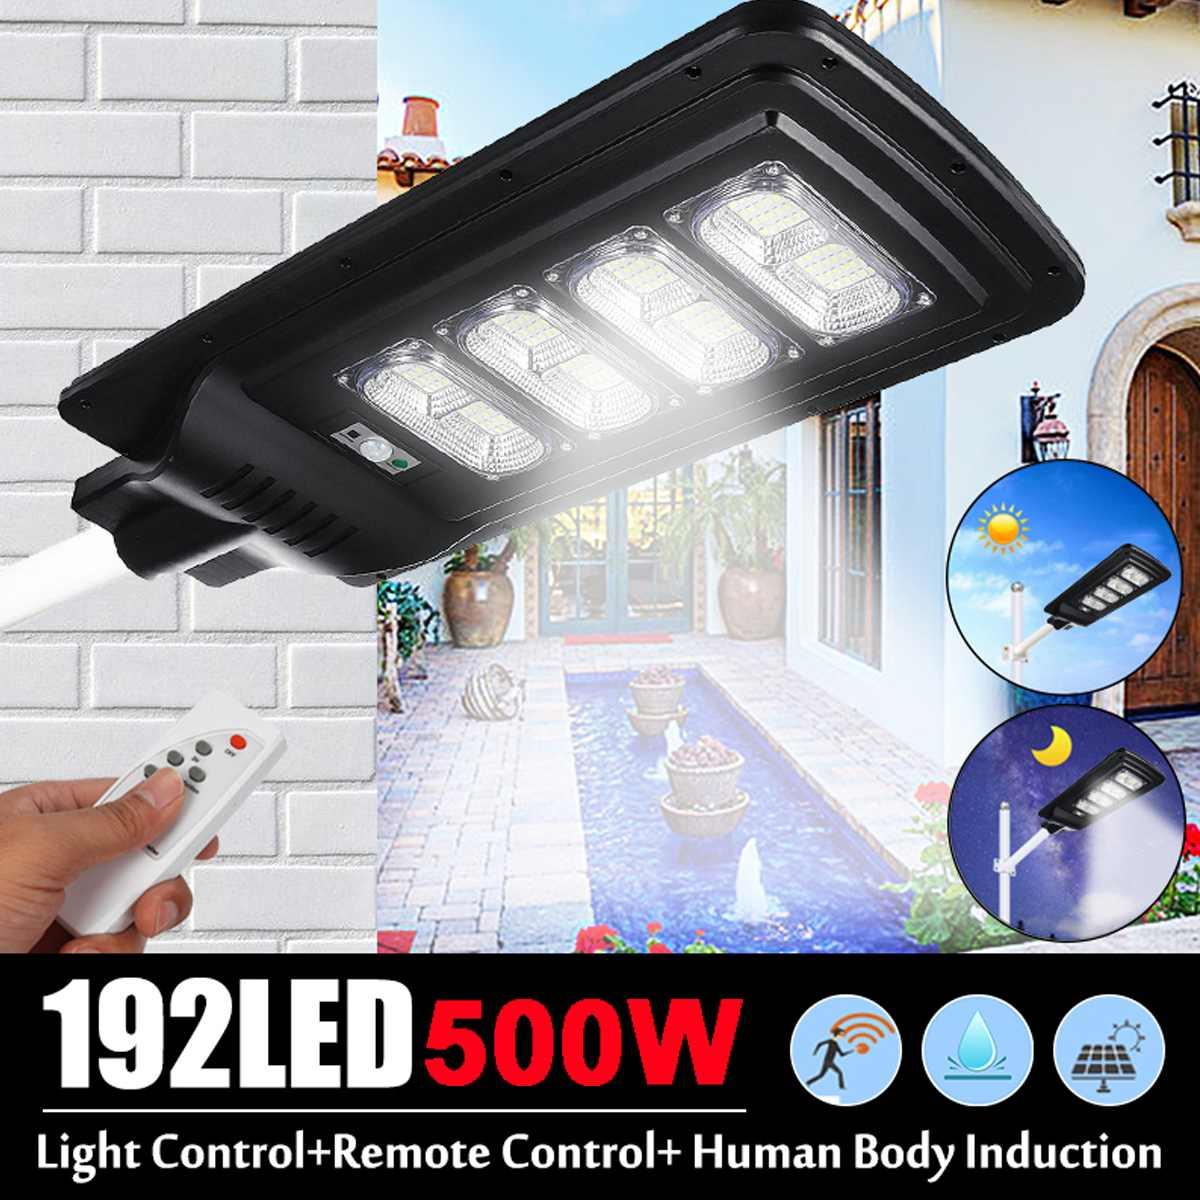 Smuxi 500w 192LEDs Solar Street Light IP67 Waterproor 3 Modes PIR Motion Sensor LED Outdoor w/Remote Controller Light Control